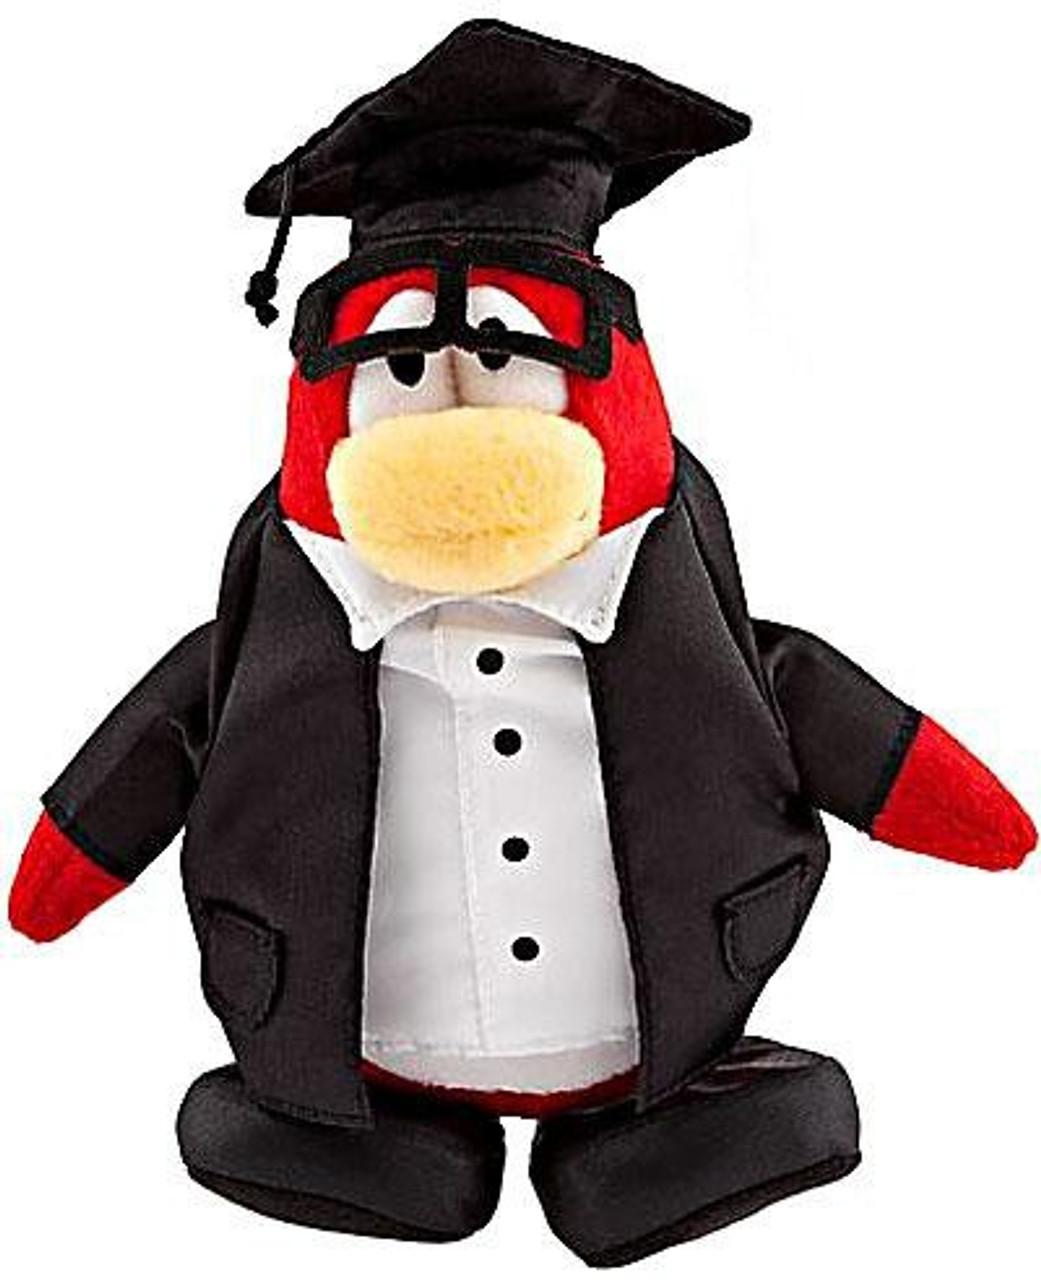 Club Penguin Series 8 Graduate 6.5-Inch Plush Figure